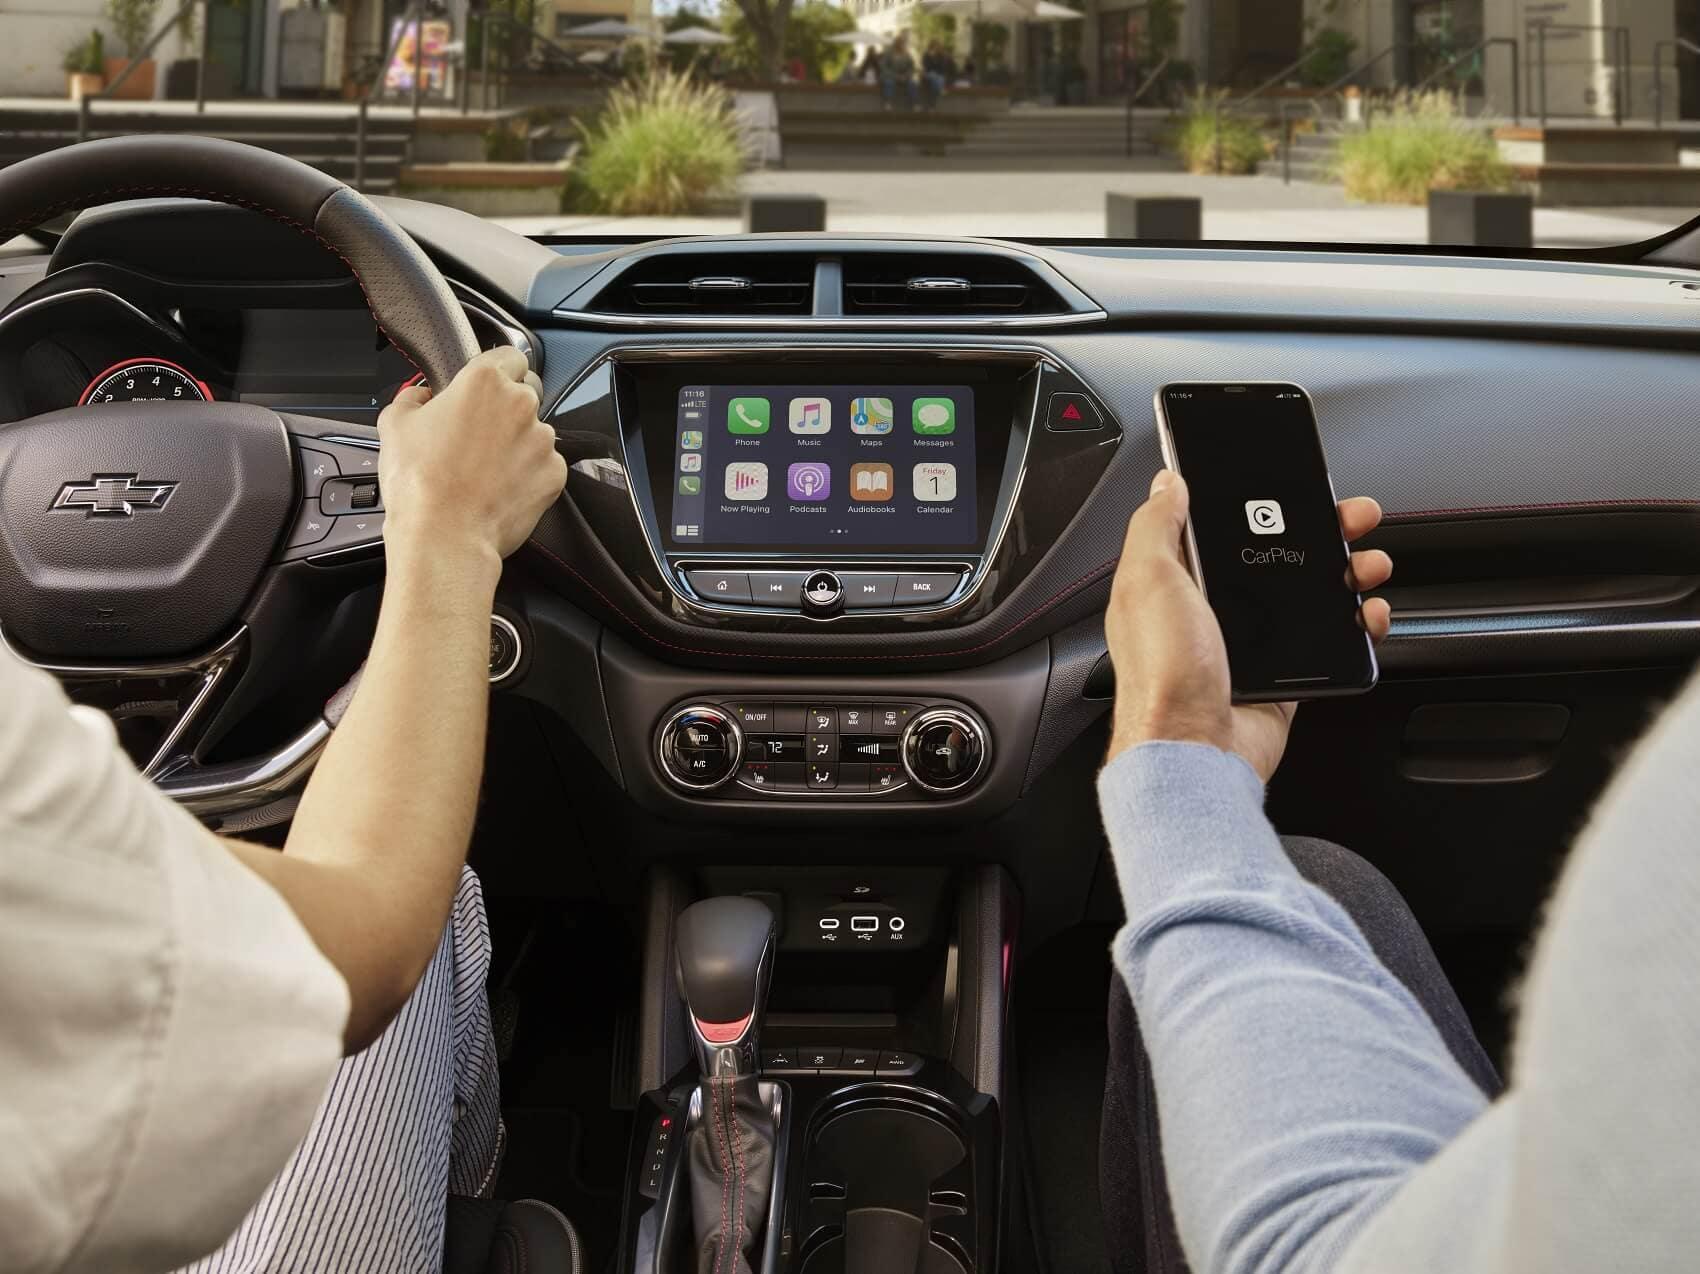 2021 Chevrolet Trailblazer Interior with Apple CarPlay®Technology